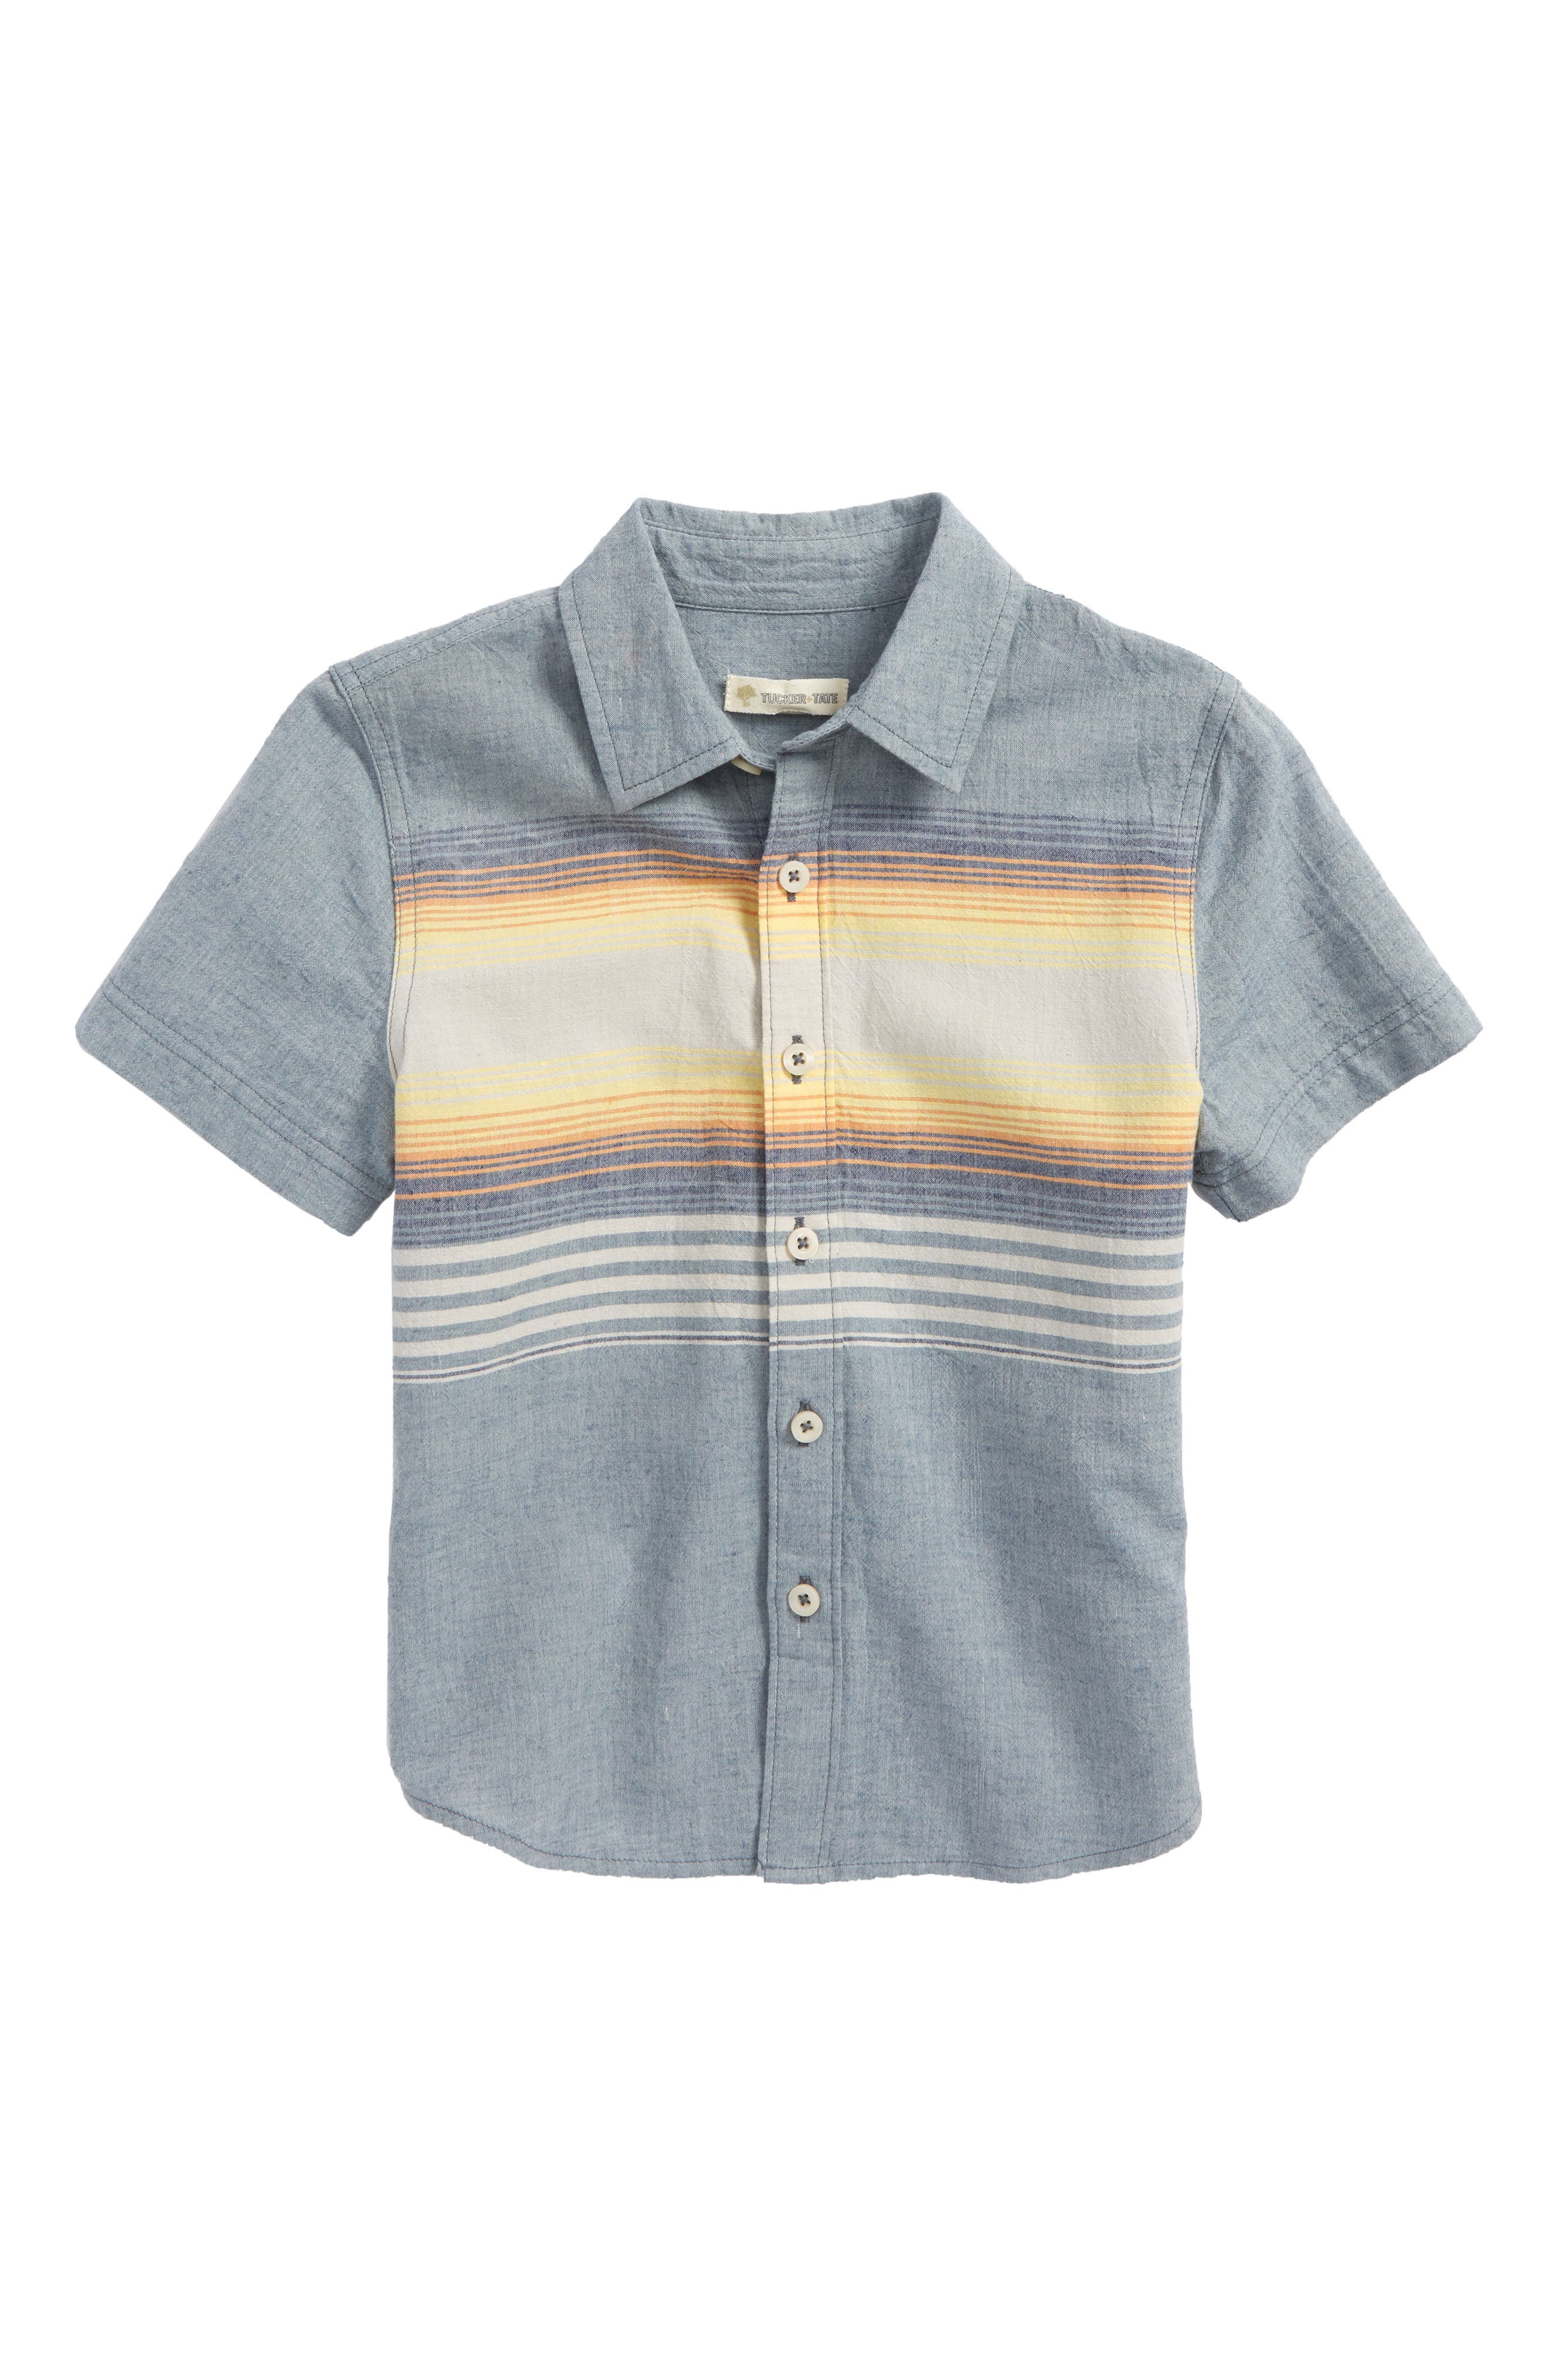 Tucker + Tate Chambray Stripe Shirt (Toddler Boys & Little Boys)